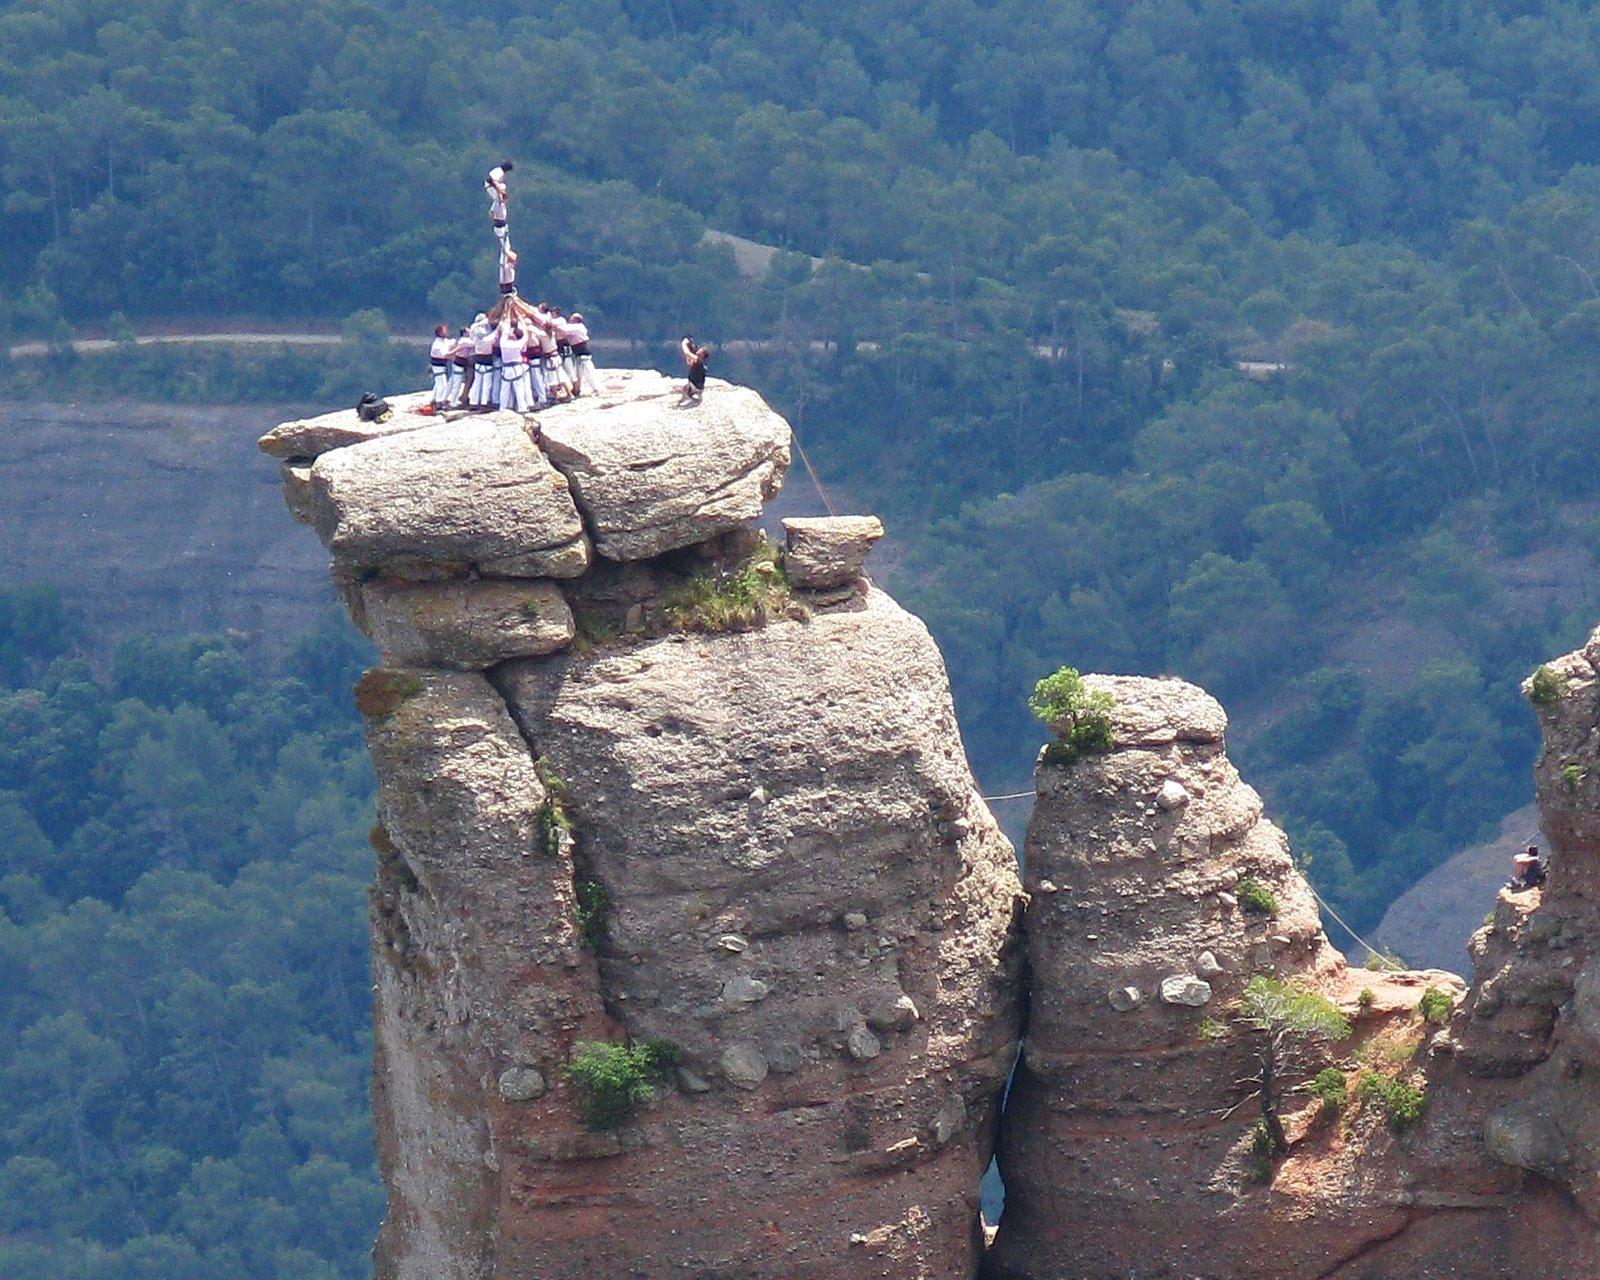 Castellers en un pico de montaña Minyons_terrassa-_castellassa_0